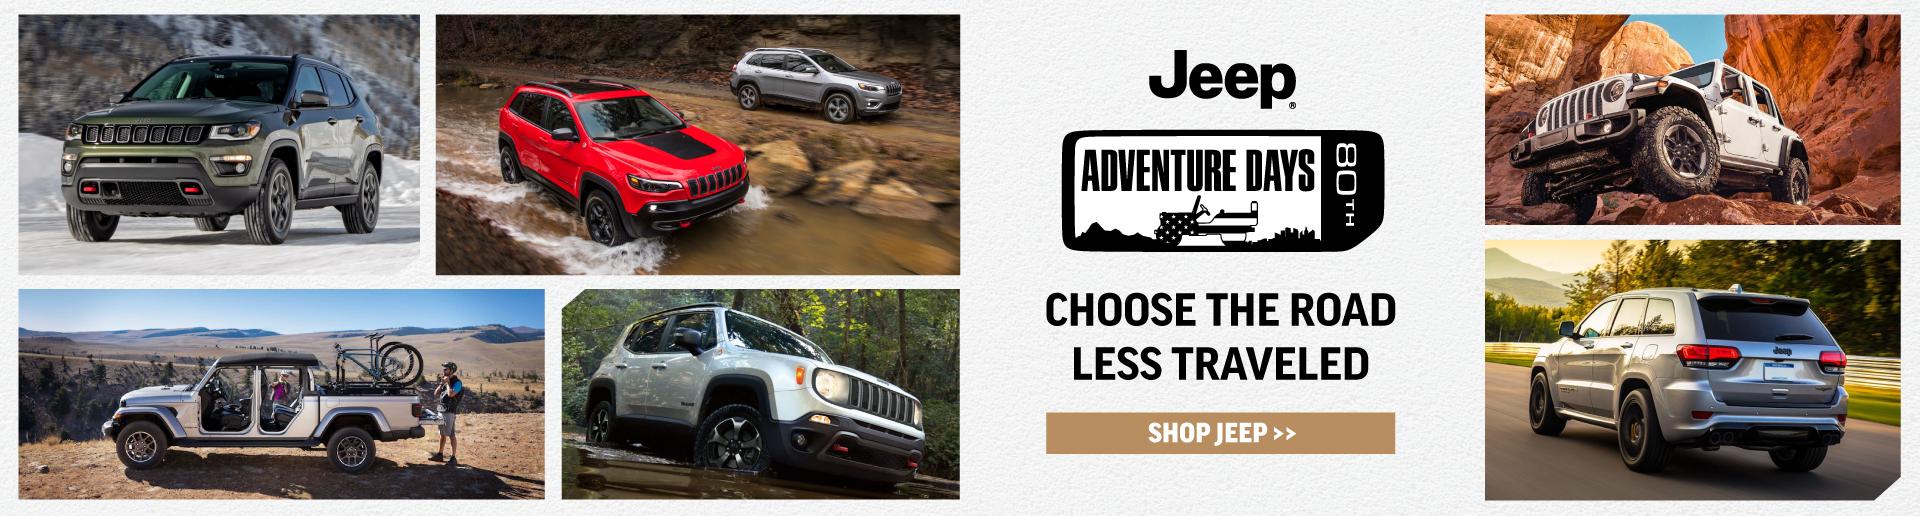 2020 Jeep Generic october